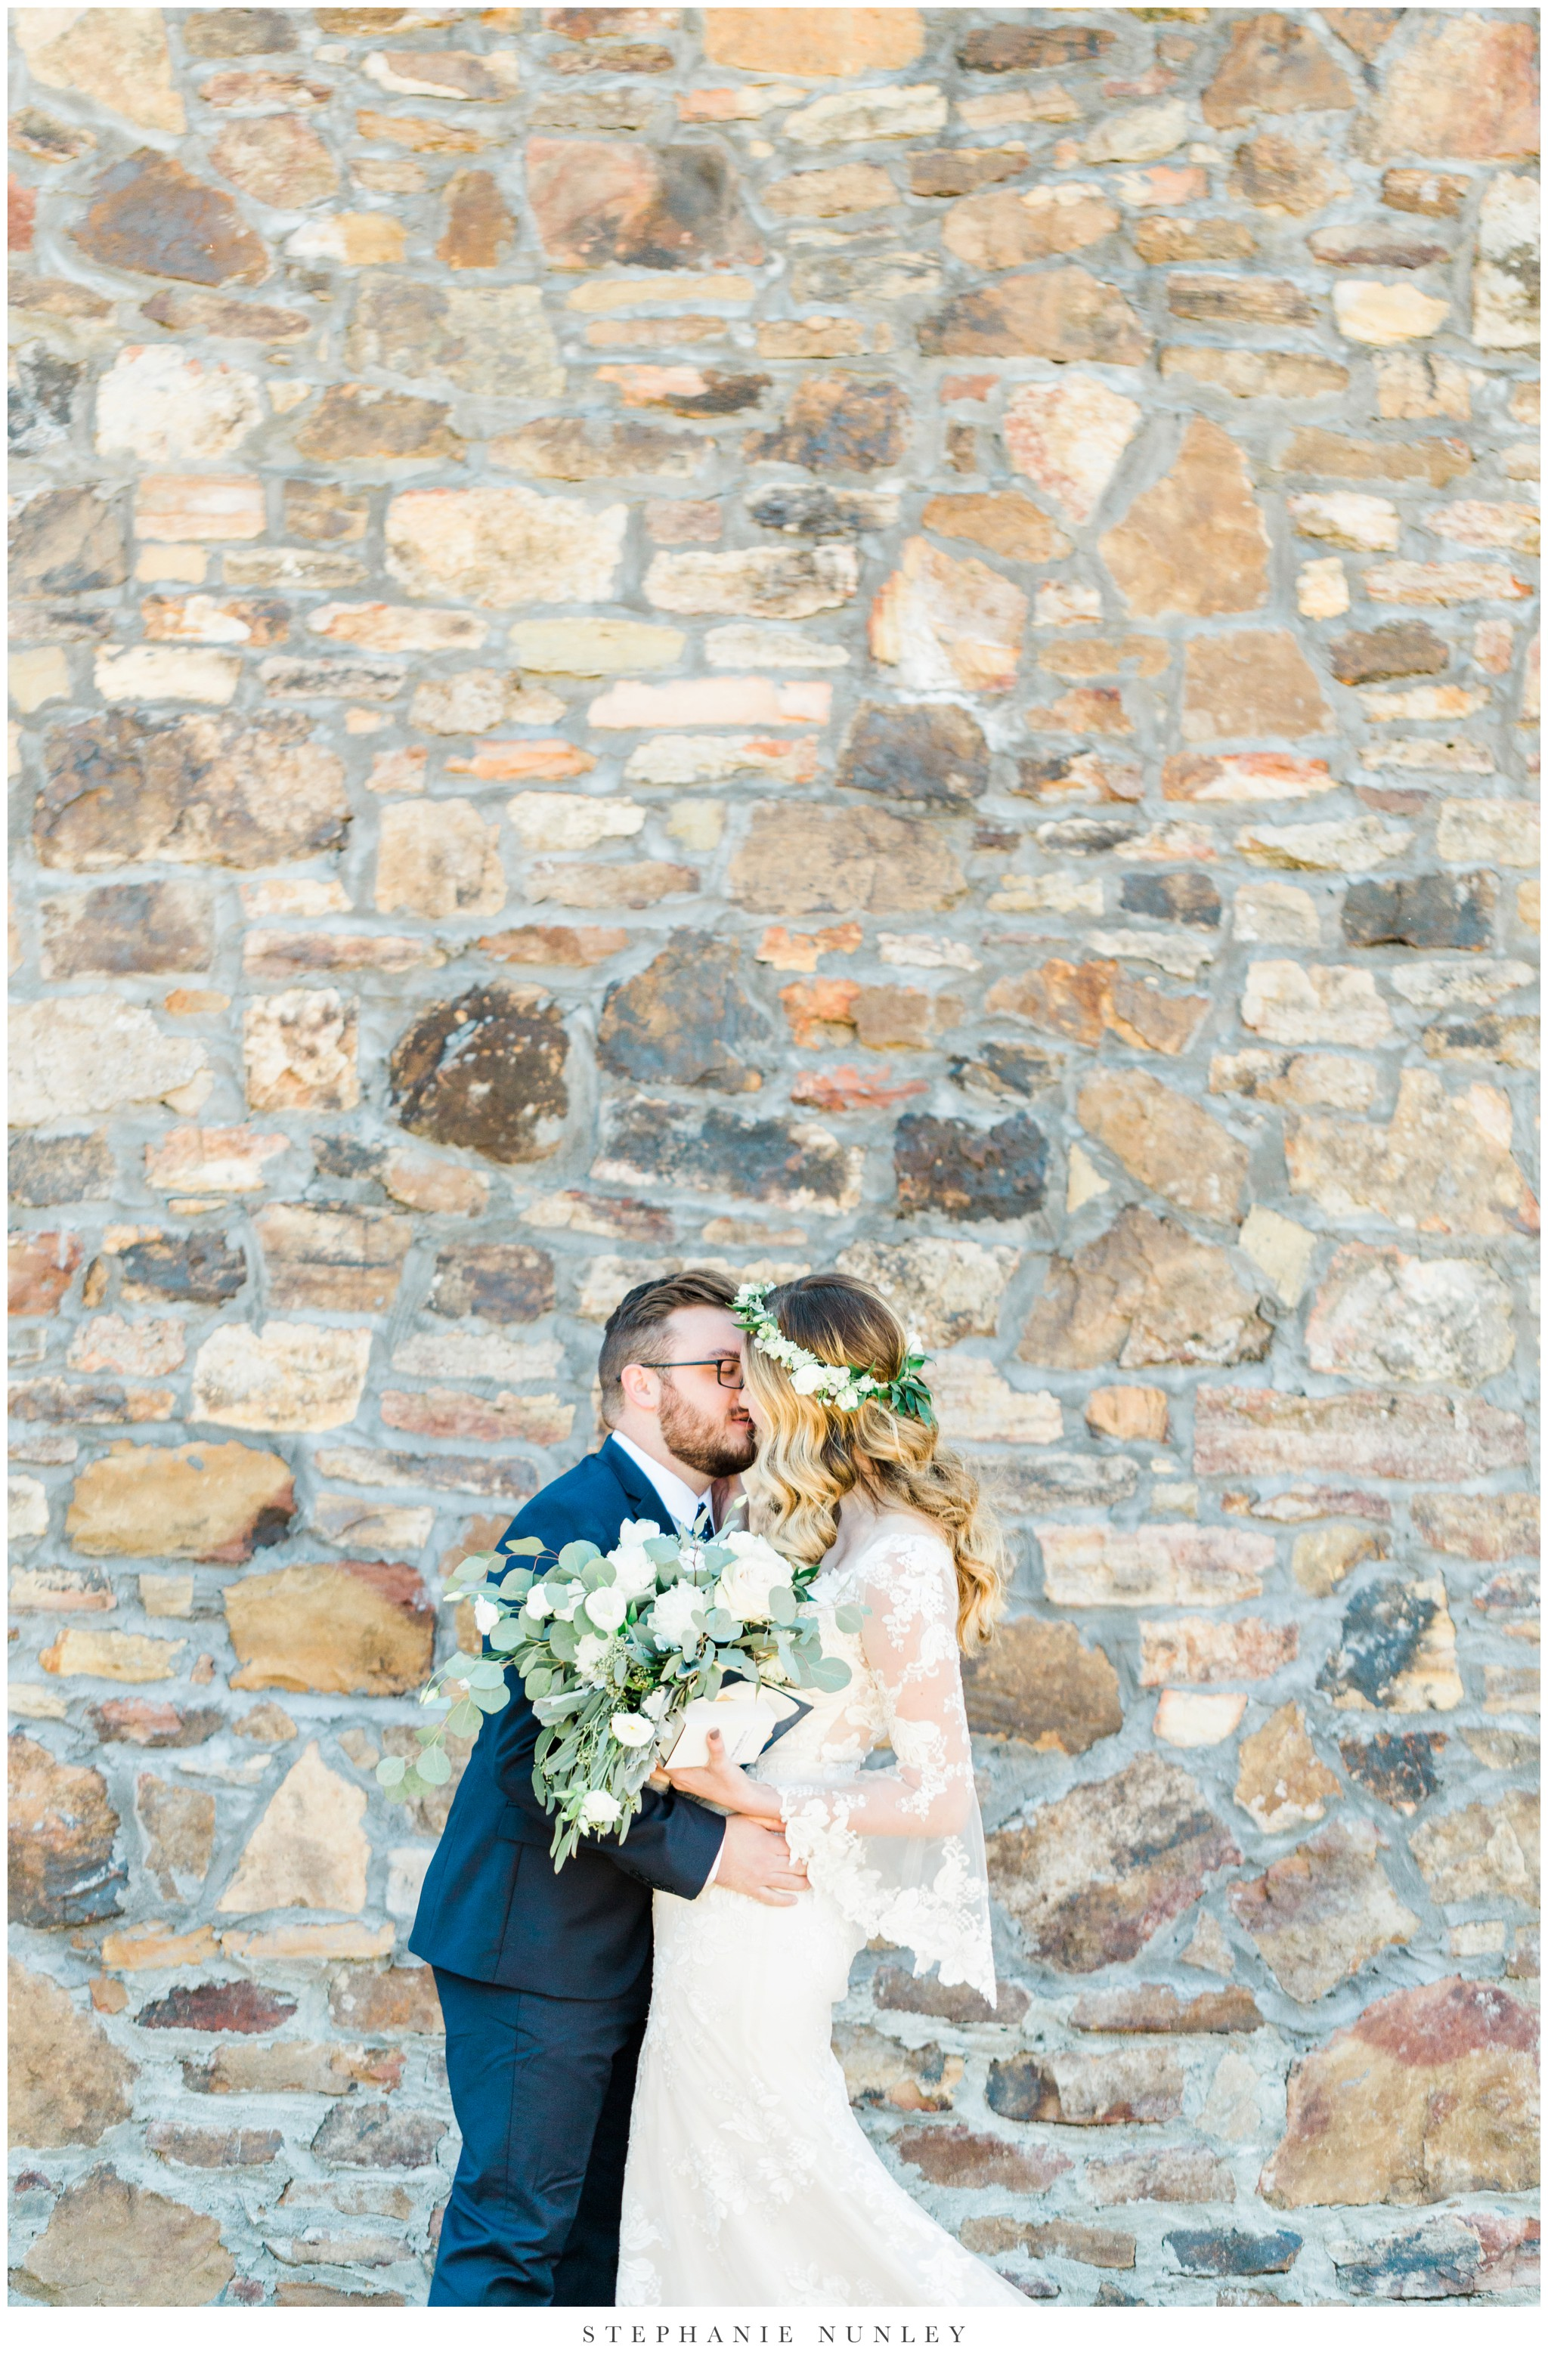 sassafrass-springs-vineyard-film-wedding-photos-28.jpg